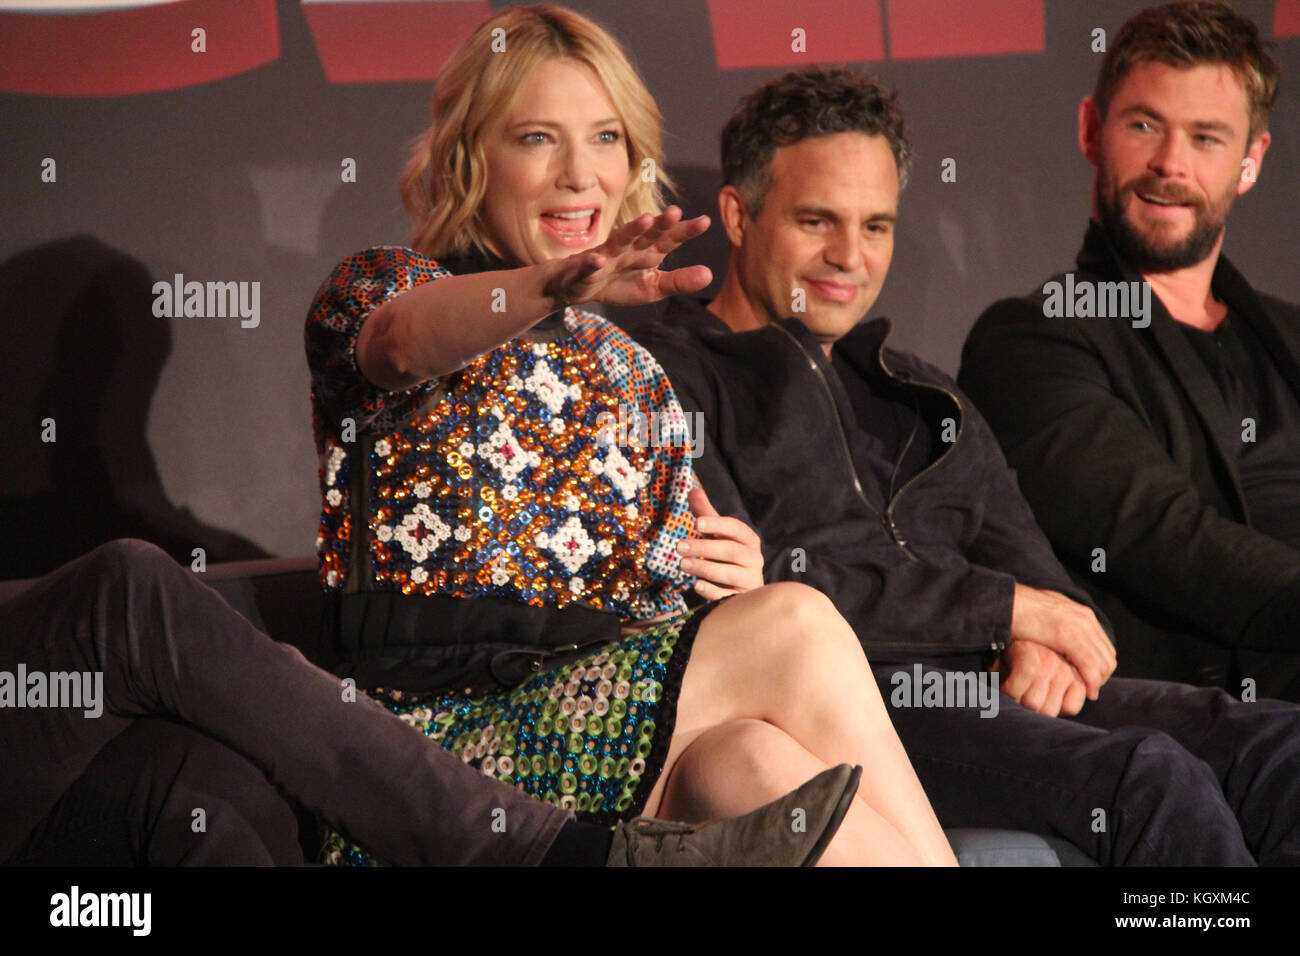 Cate Blanchett, Mark Ruffalo, Chris Hemsworth  10/11/2017 'Thor: Ragnarok' Press Conference held at Montage - Stock Image